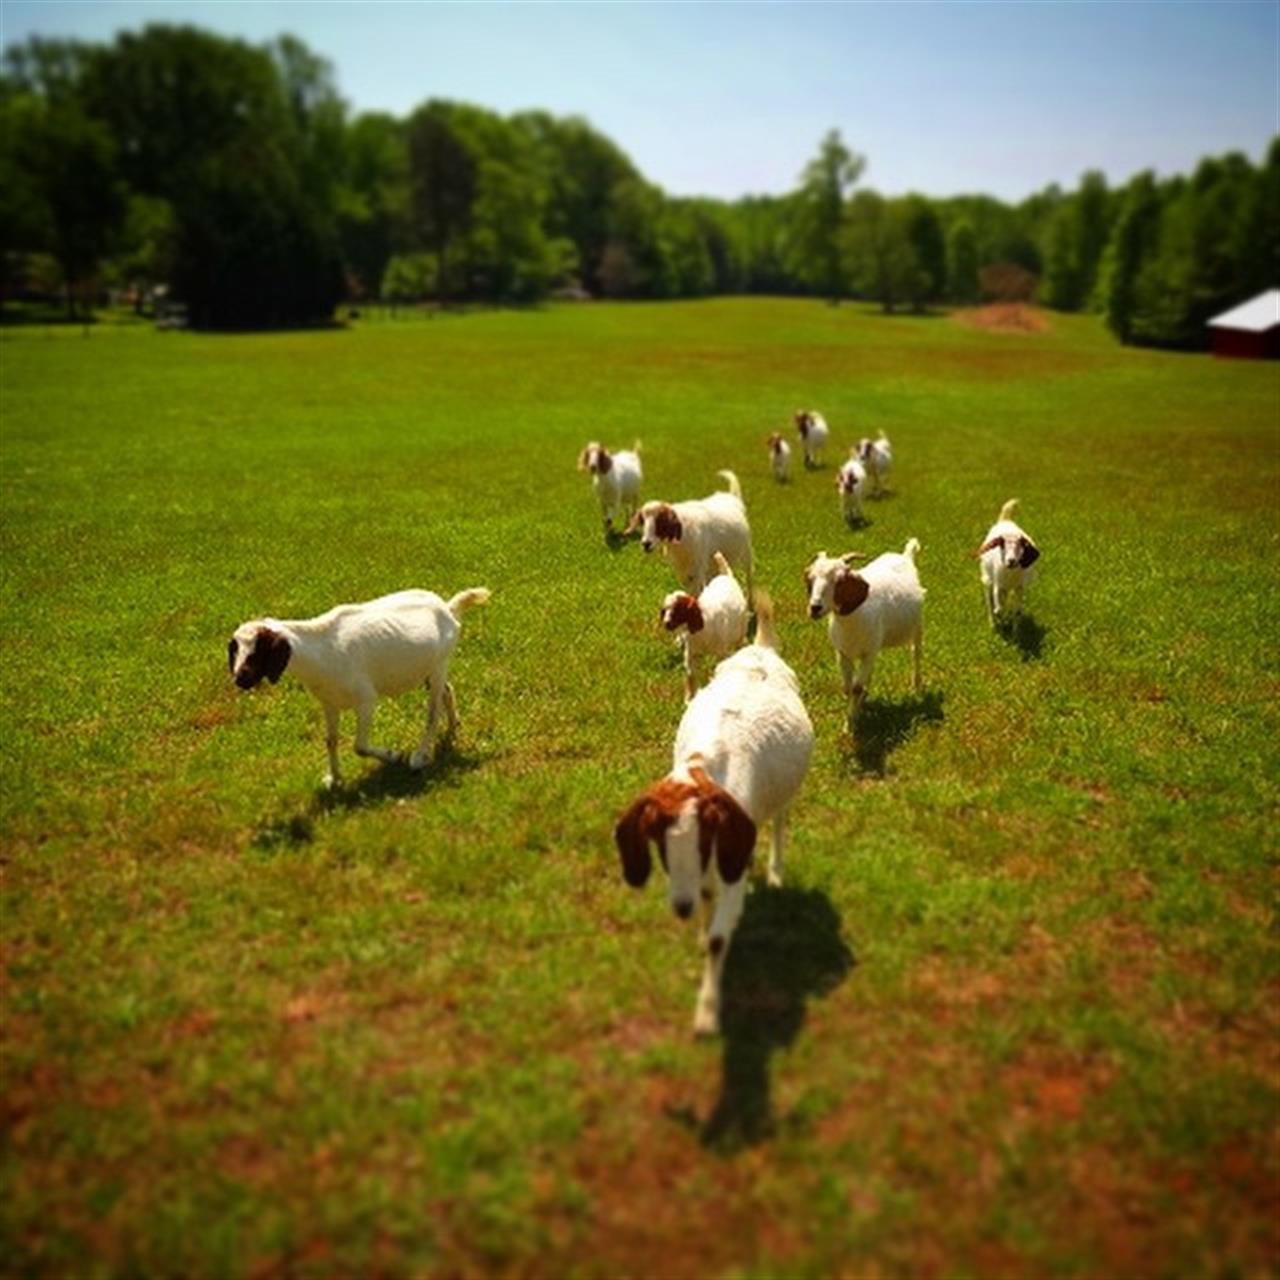 Lucky farm babies! #goatsconvey! #Pfafftown #LeadingRElocal